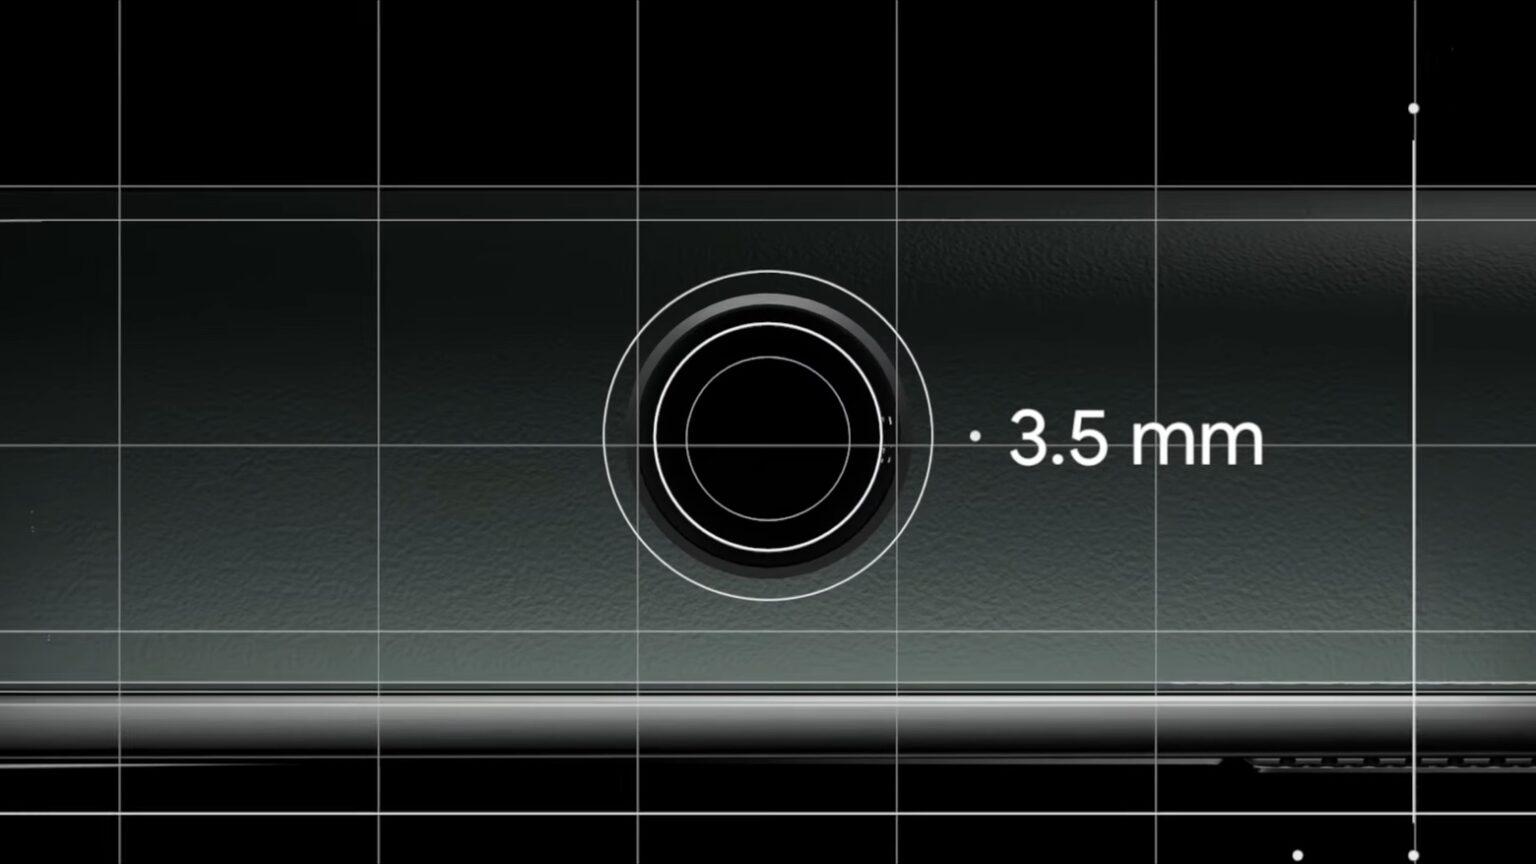 Google hilariously mocks Jony Ive's Apple product videos